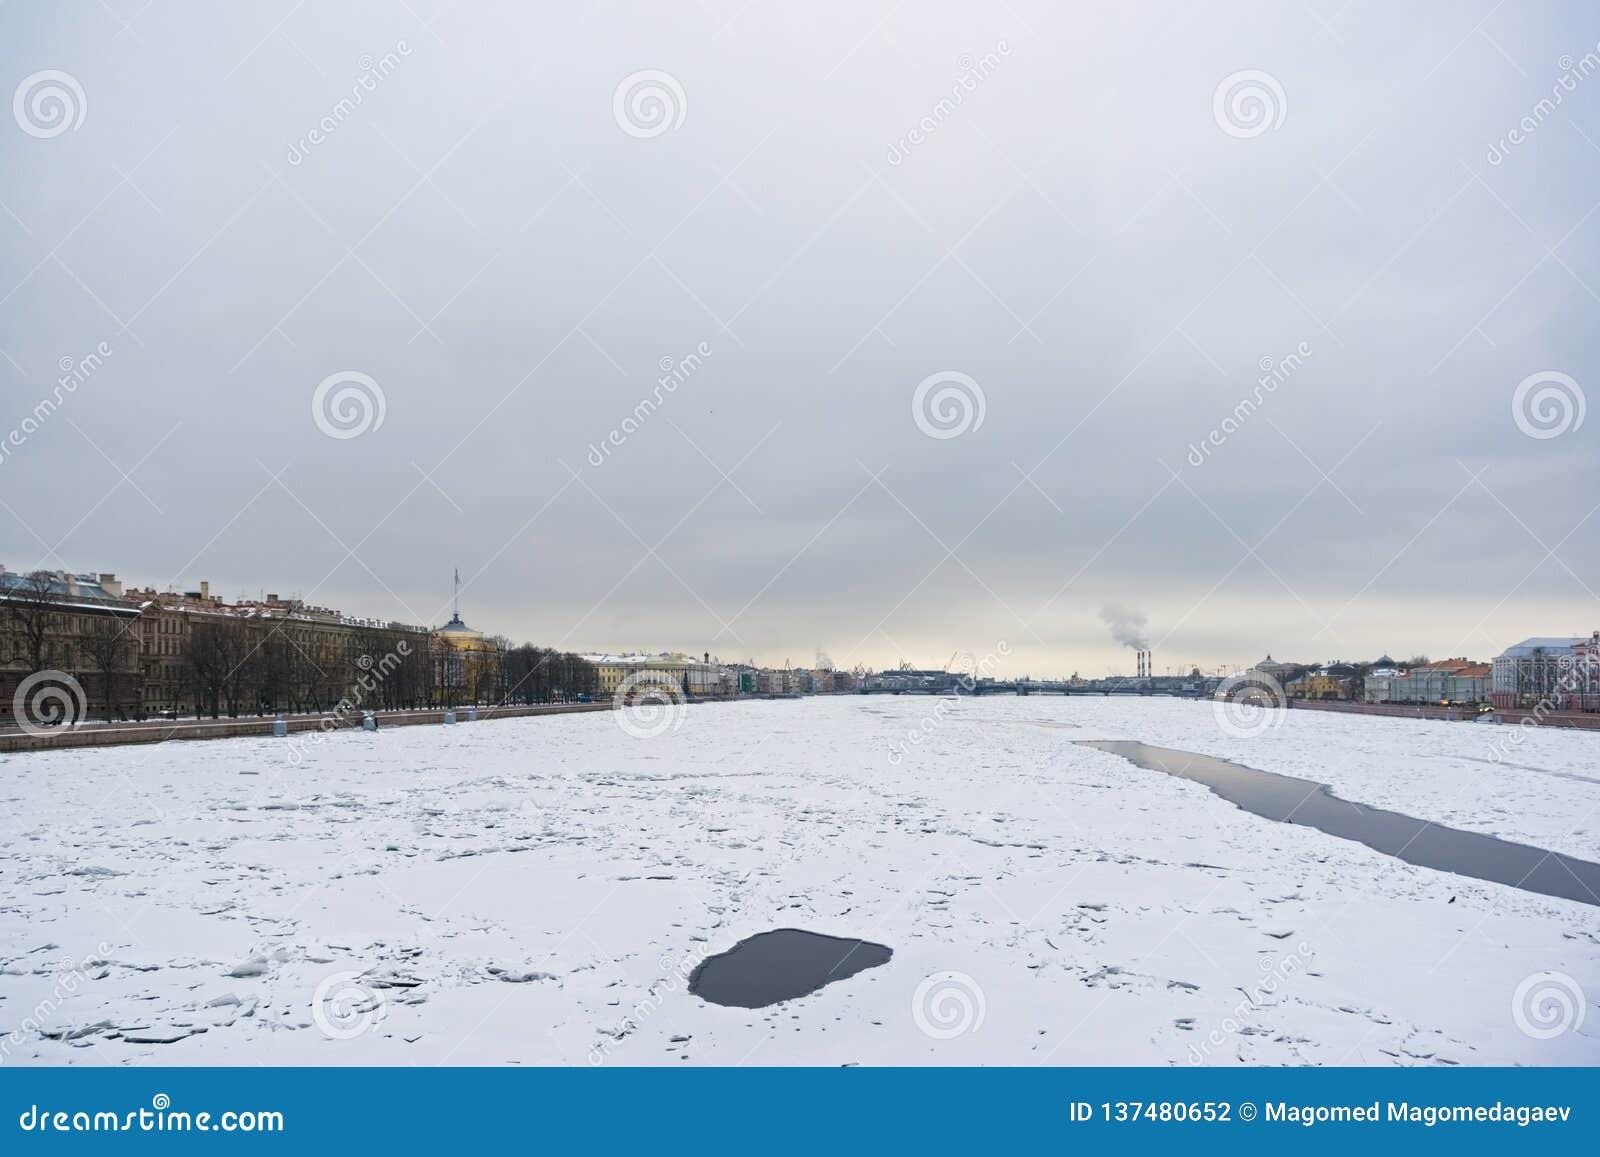 Winter on Neva river. Saint Petersburg, Russia. View on Admiralty embankment and Annuncuation bridge. Horizontal shot stock photography